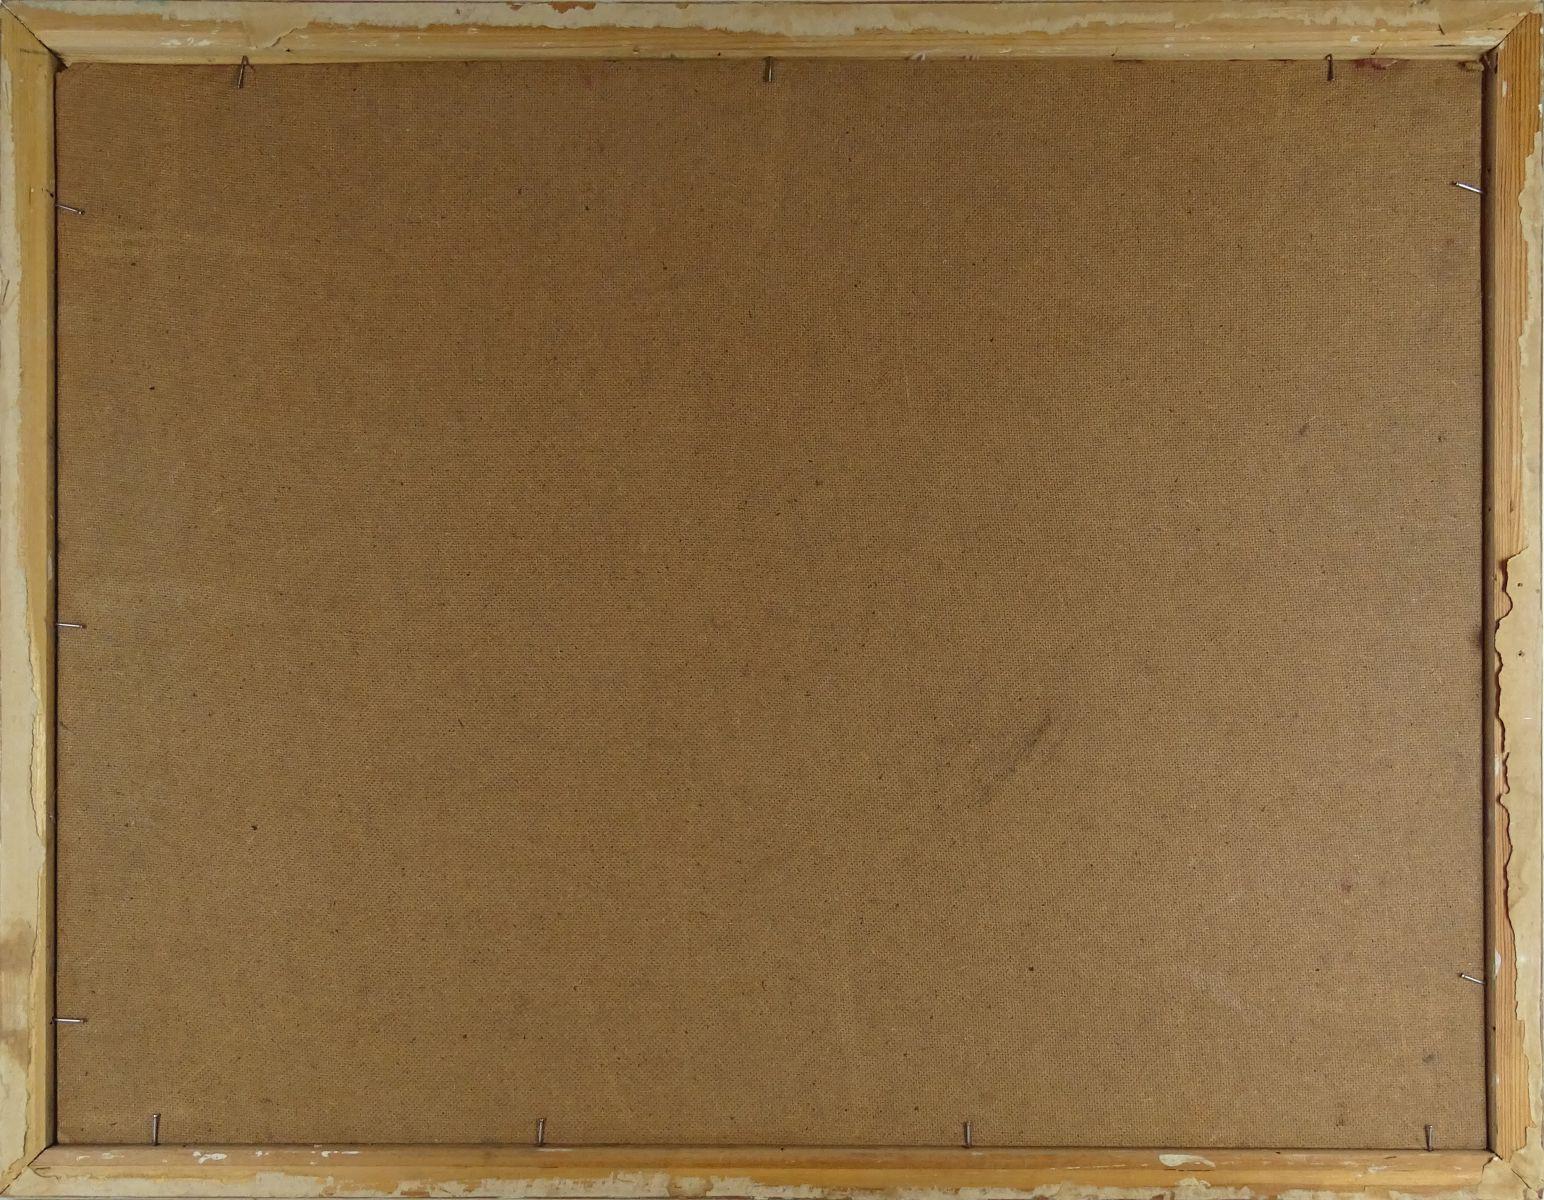 DSC01336.JPG (1544×1200)